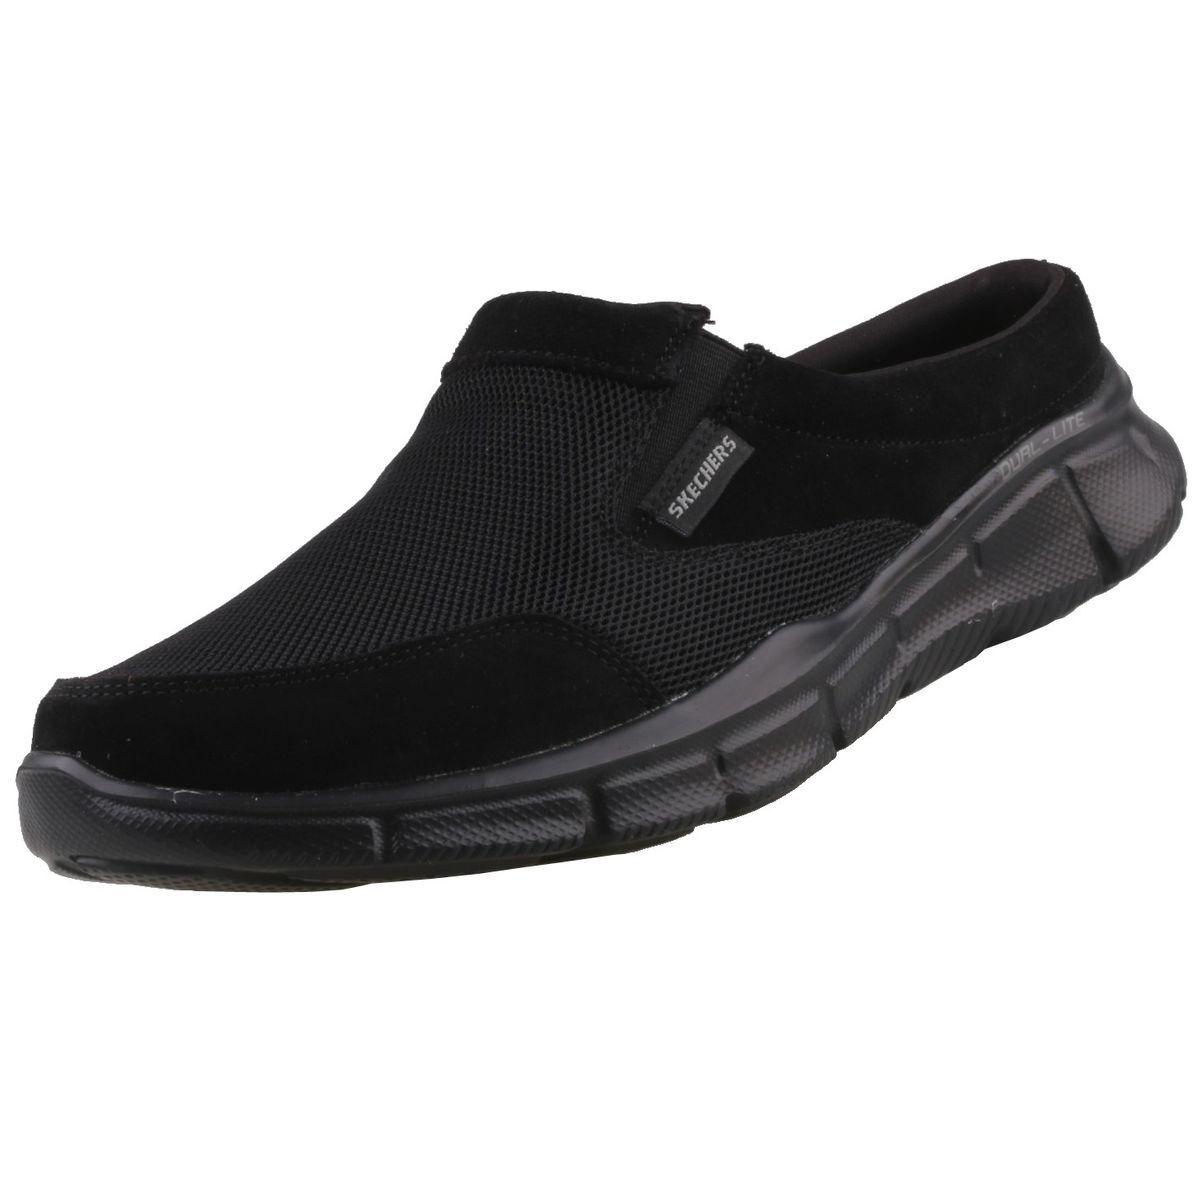 Nuevo Skechers zapatos caballero zapatos sandalias sabot Clogs mocasines sandalias